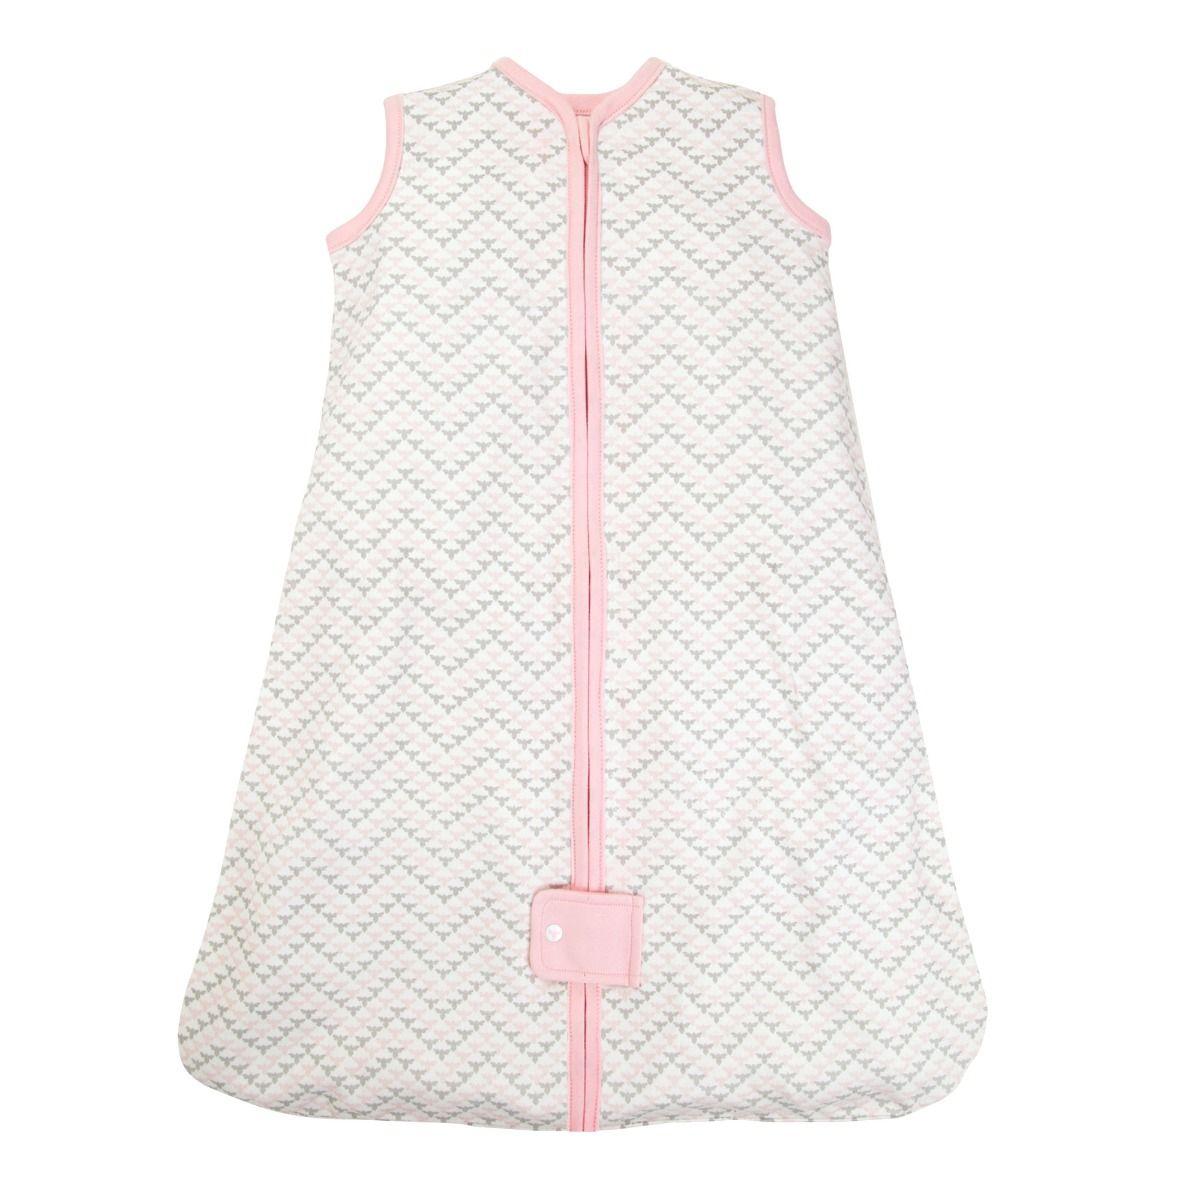 8c6b44574f5 Beekeeper™ Chevron Organic Baby Wearable Blanket